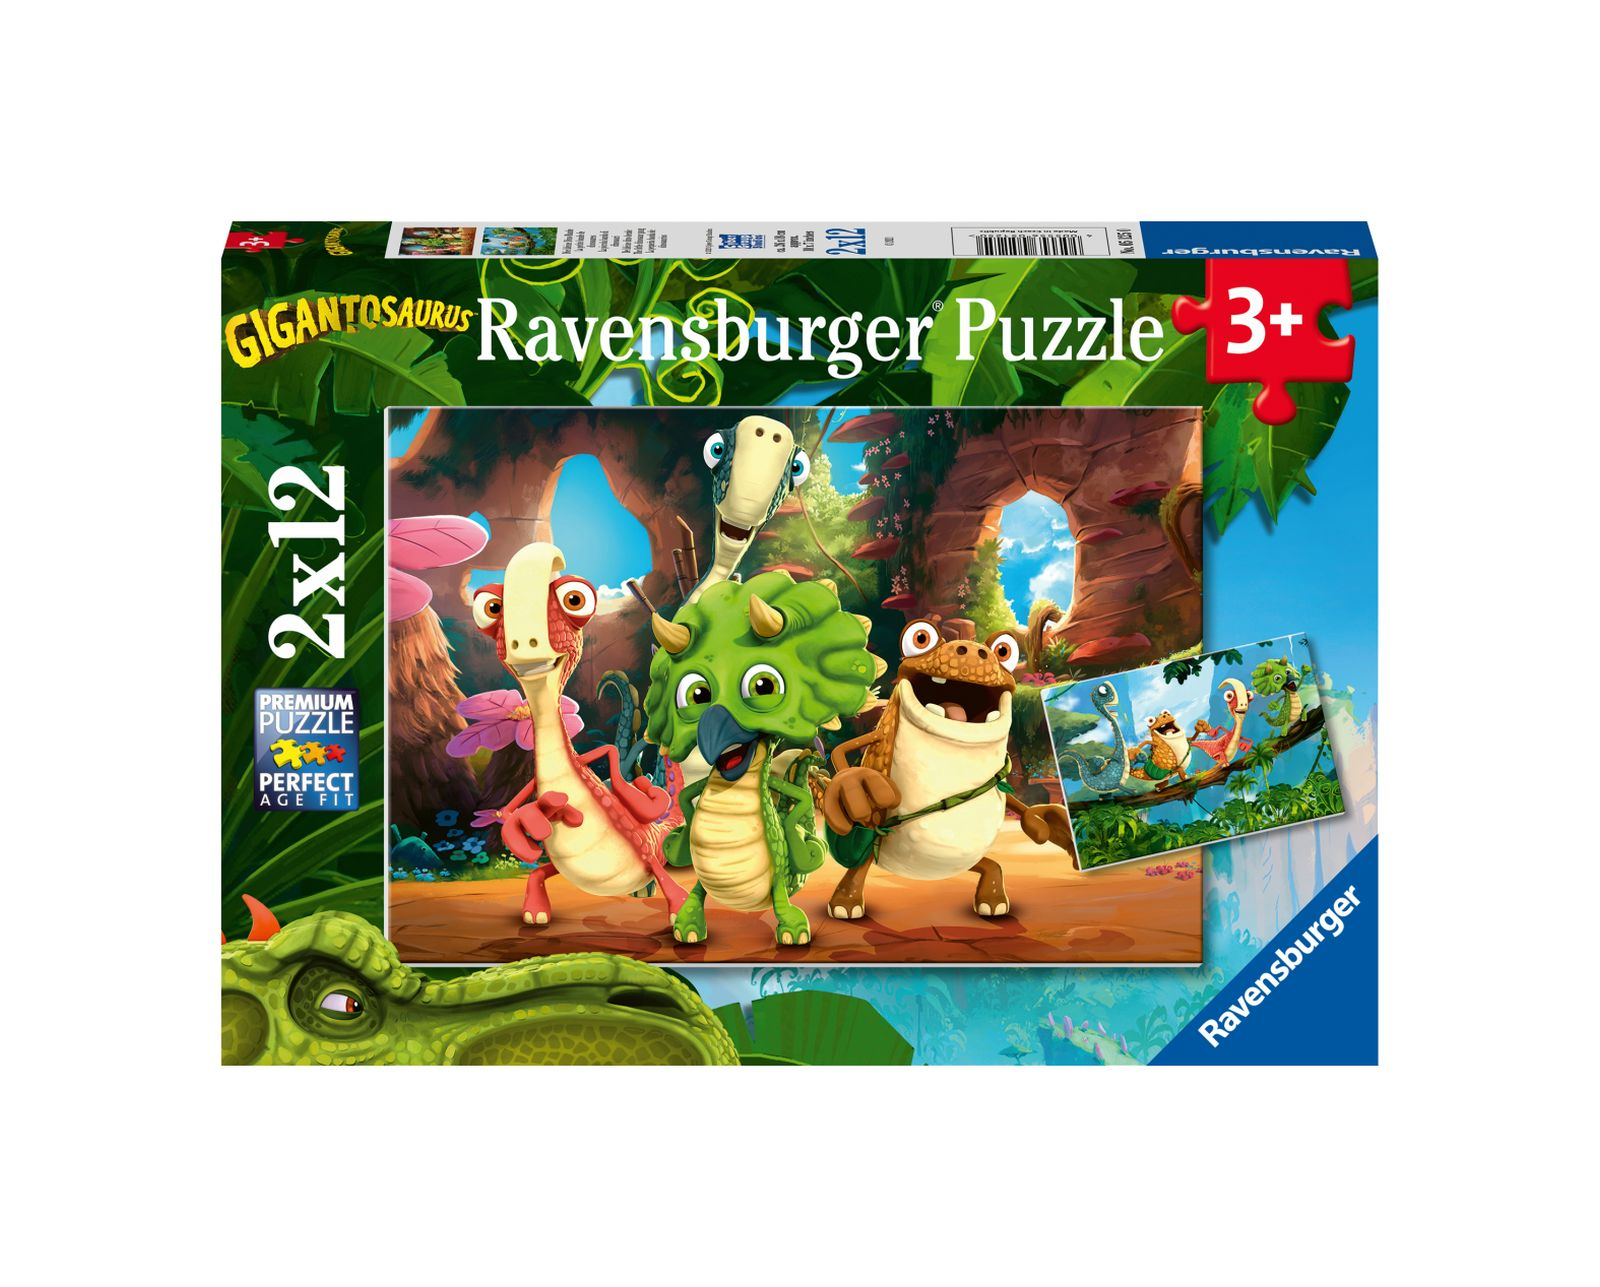 Ravensburger puzzle 2x12 pezzi - gigantosaurus - Ravensburger1